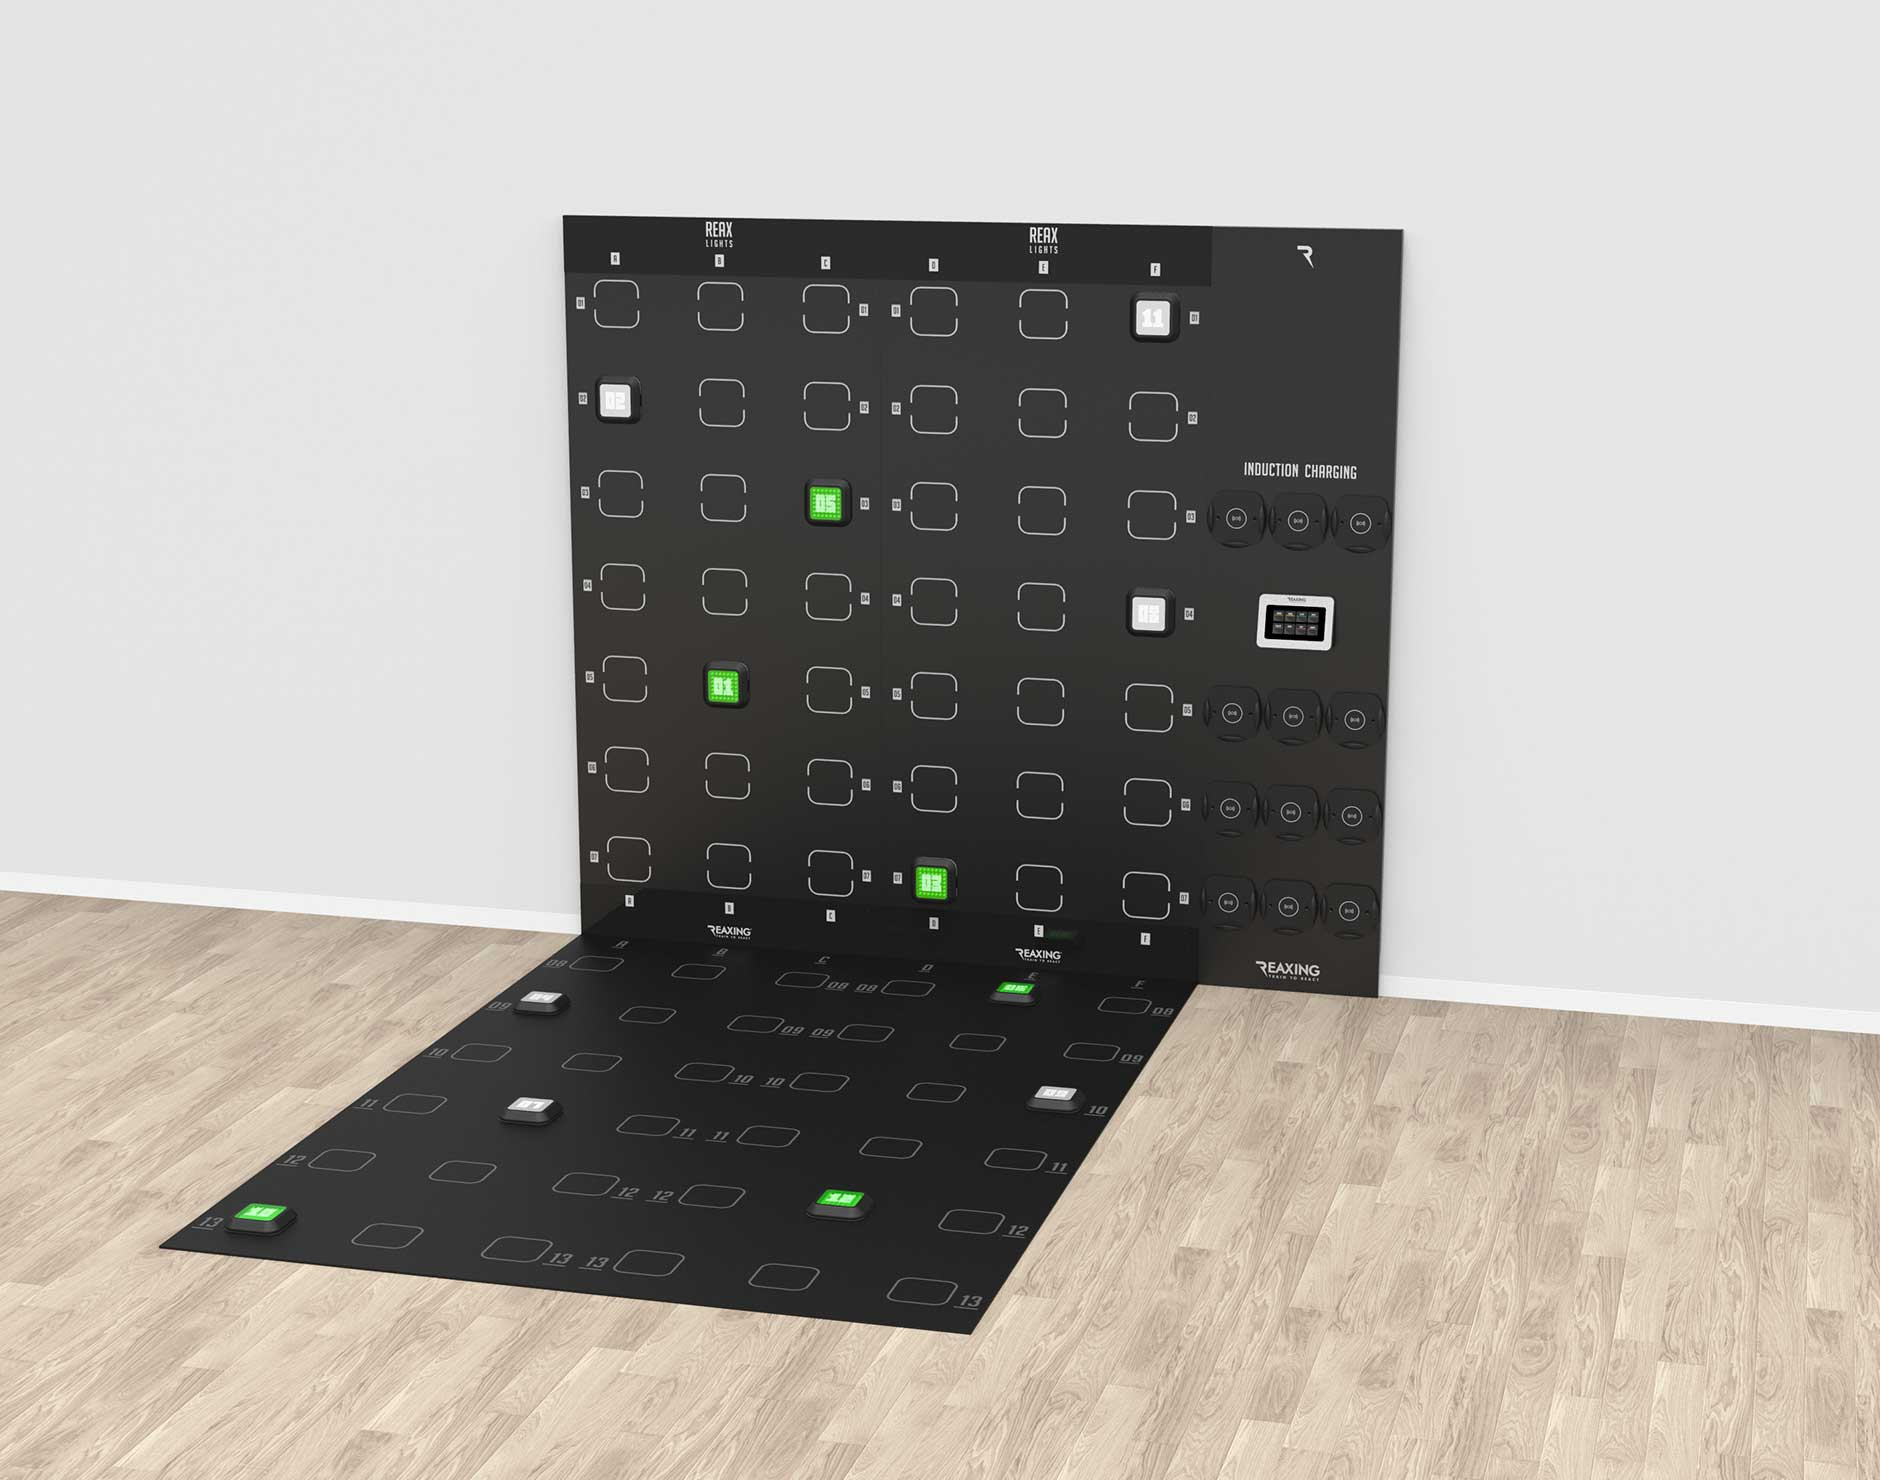 Panel Configuration 5